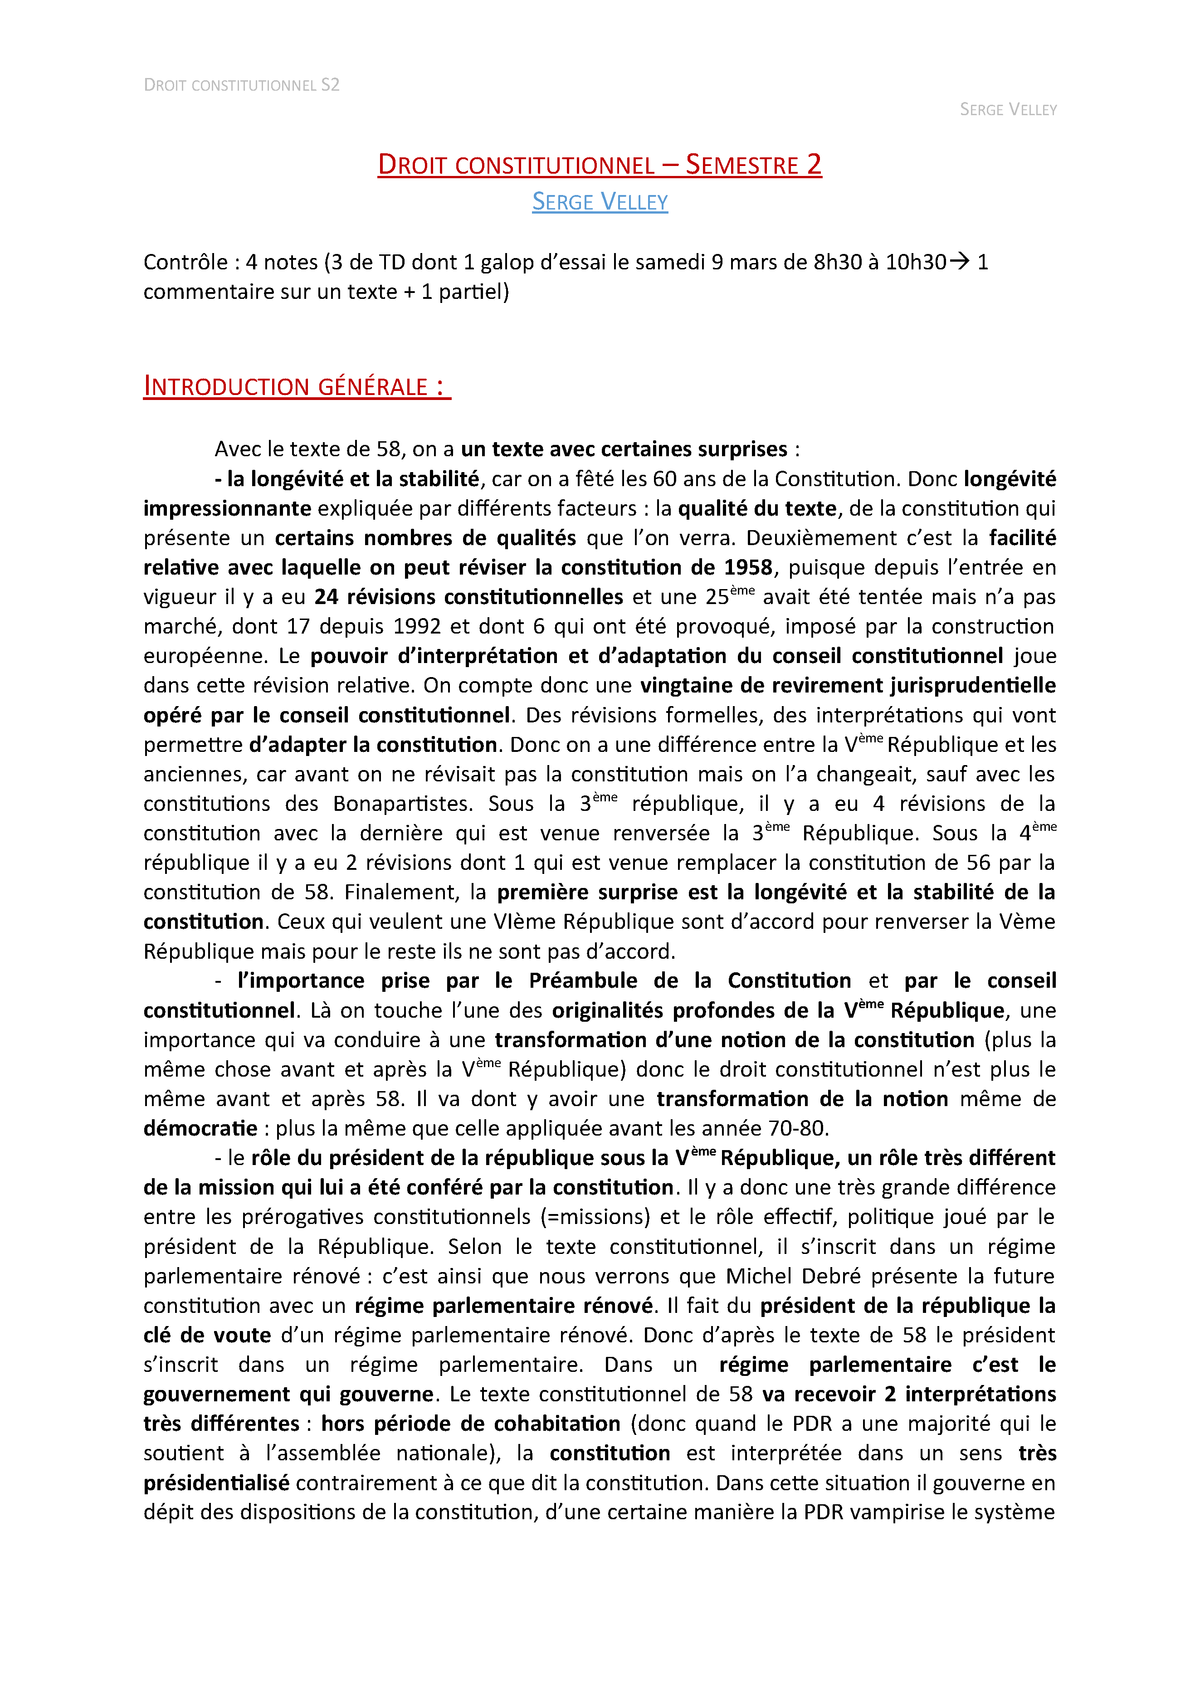 Droit constitutionnel - Semestre 2 - StuDocu